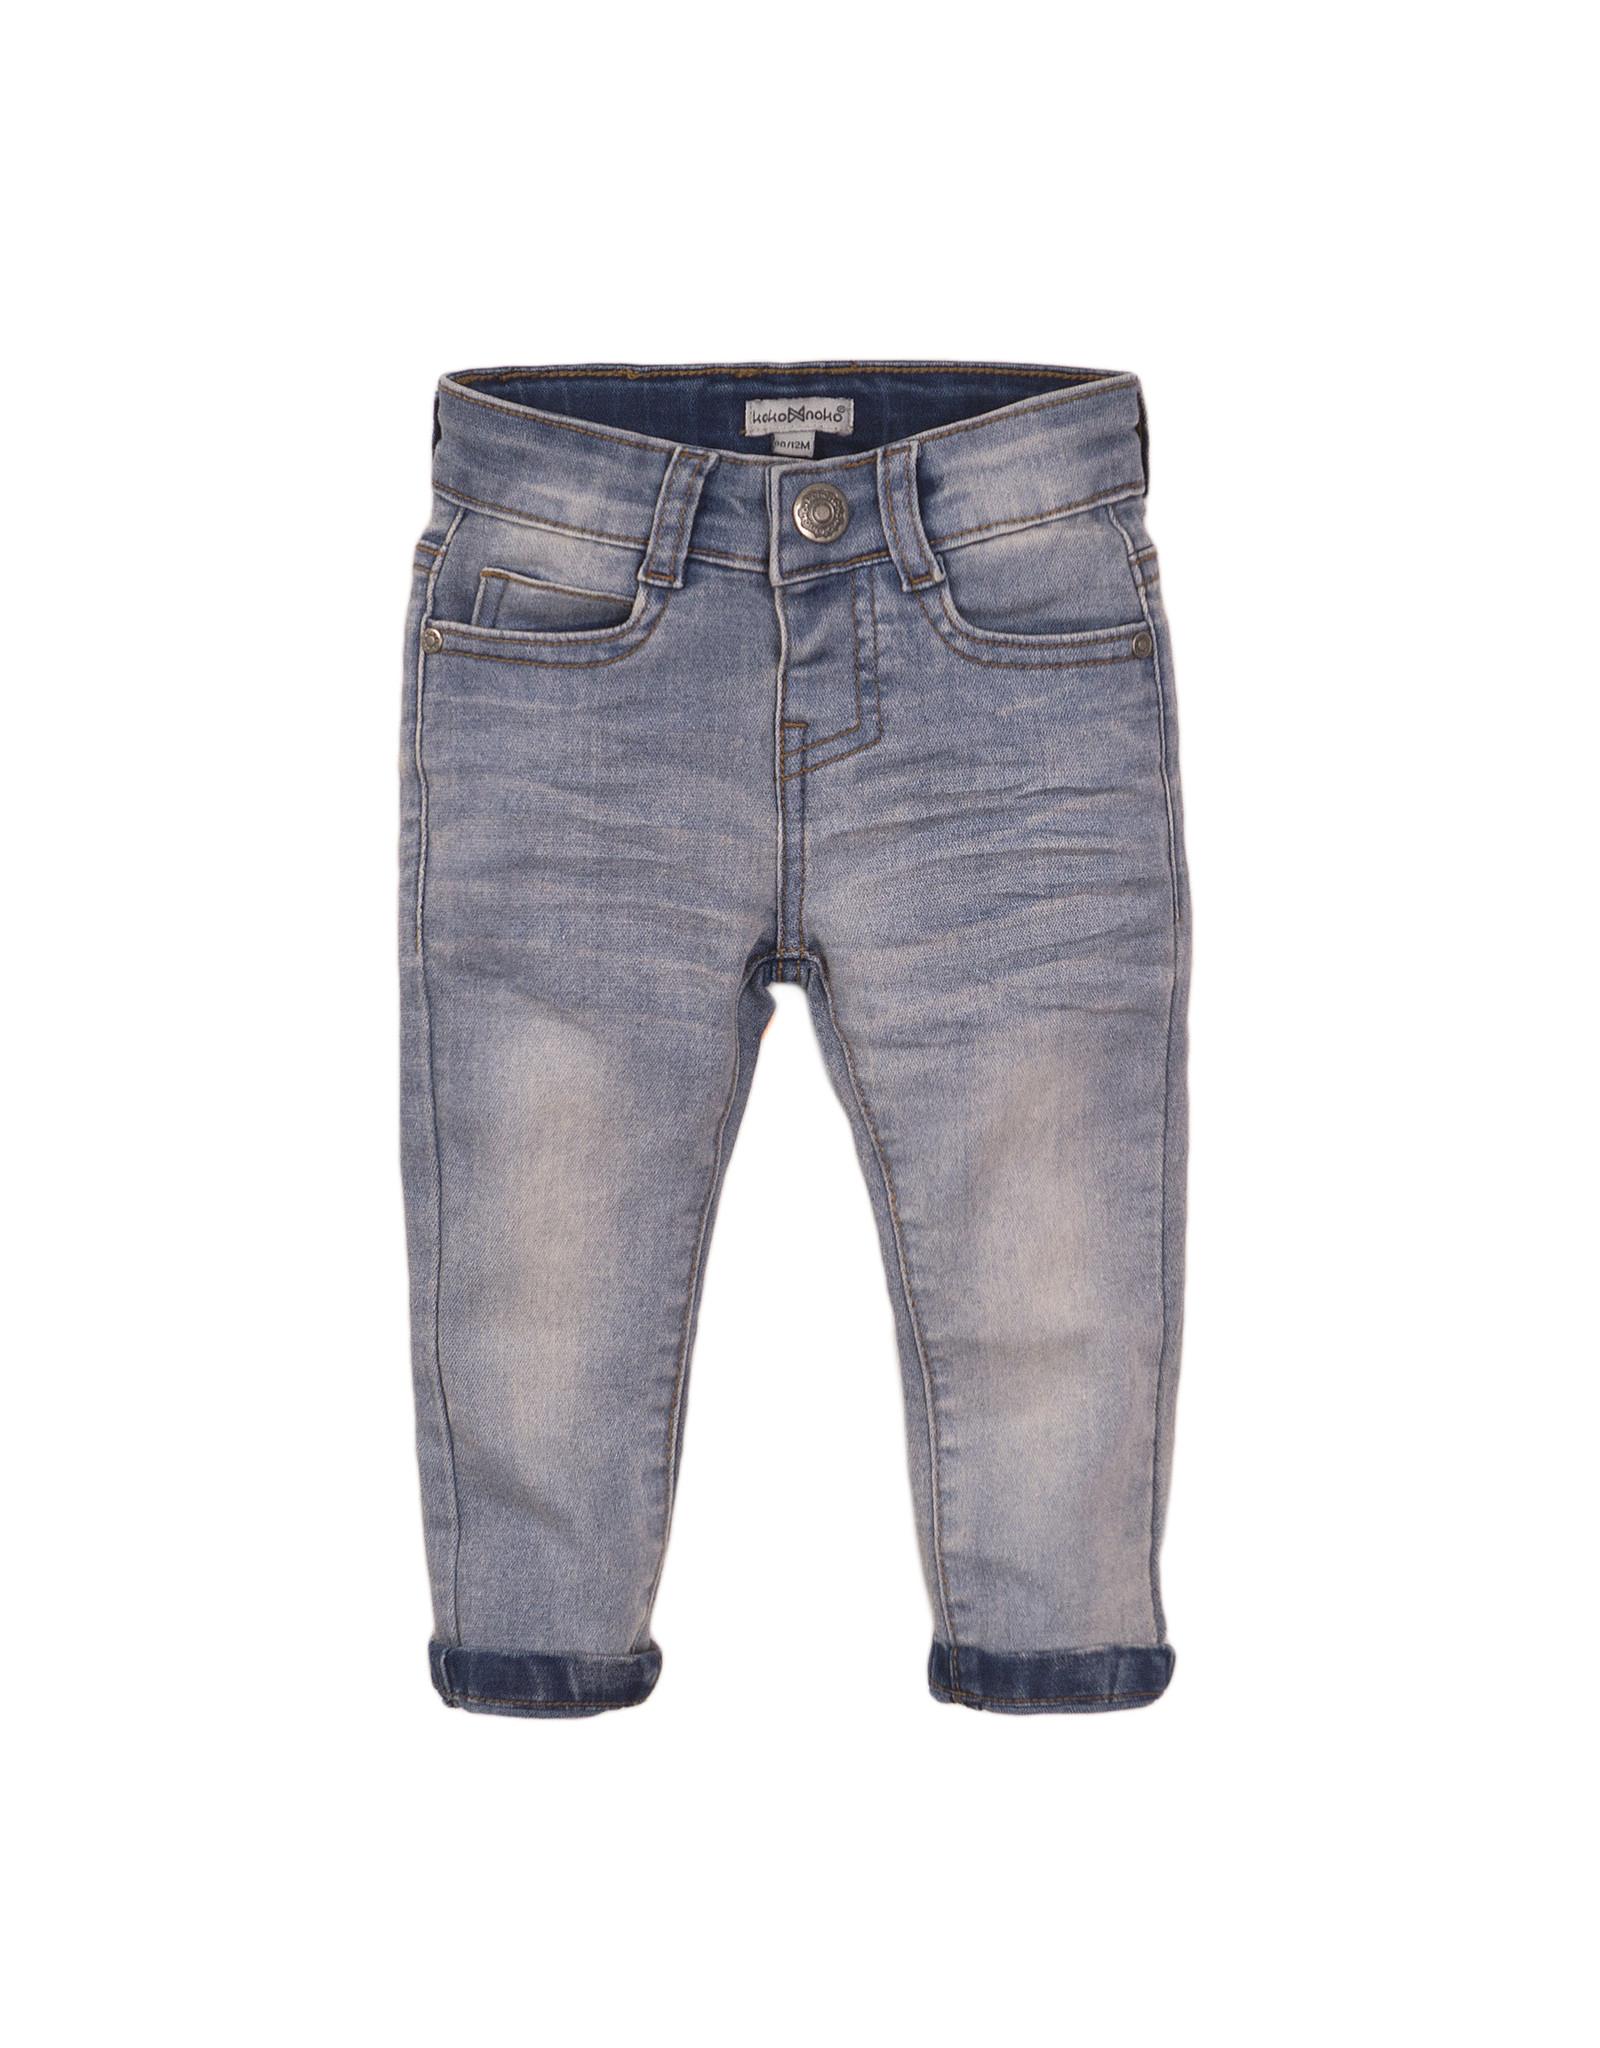 Koko Noko Jeans, Blue jeans, SS21